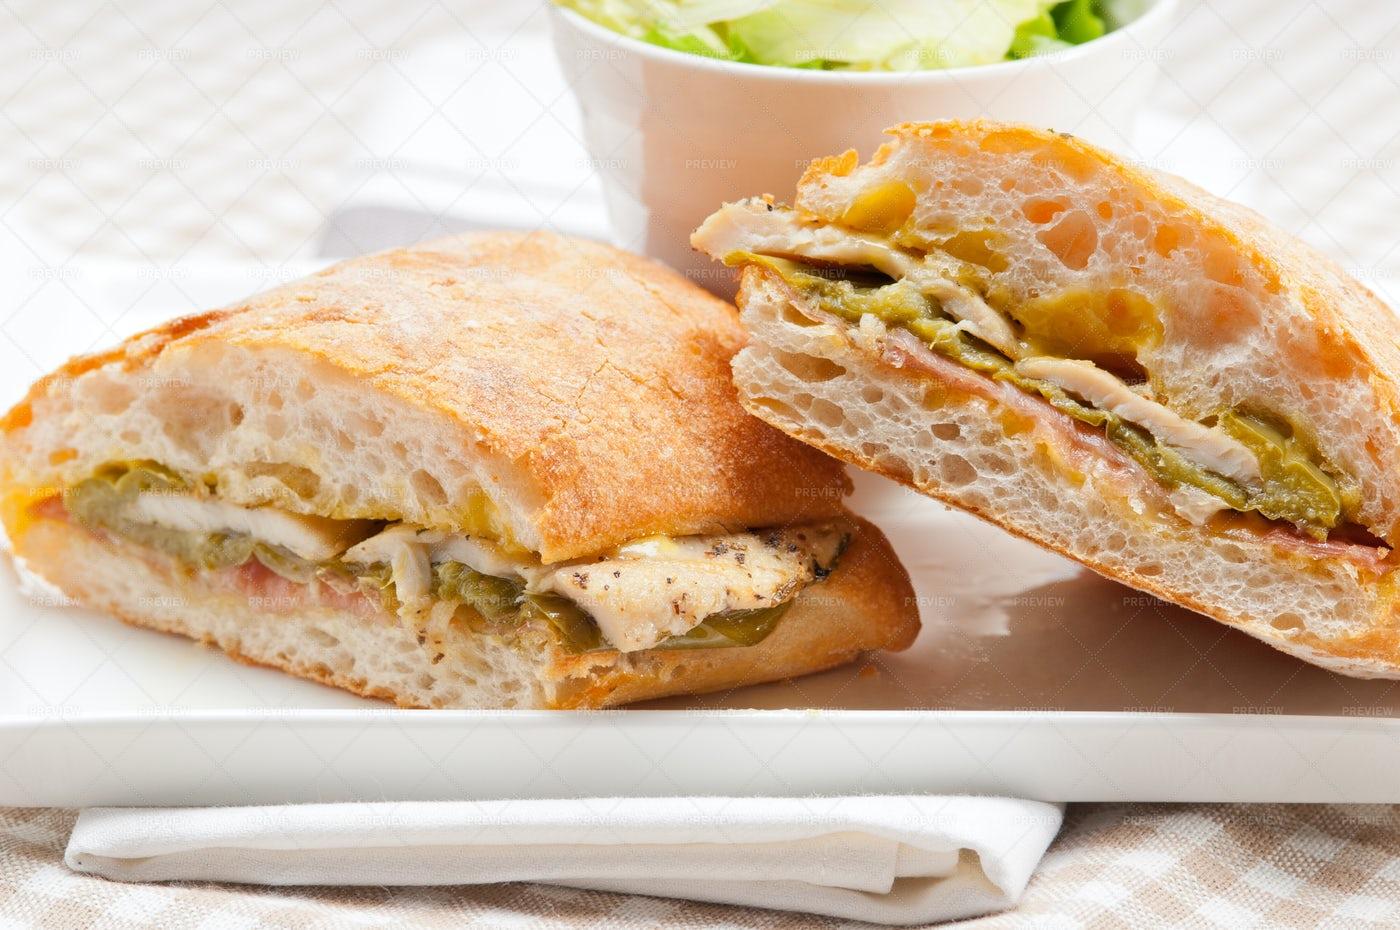 Italian Panini Sandwich: Stock Photos